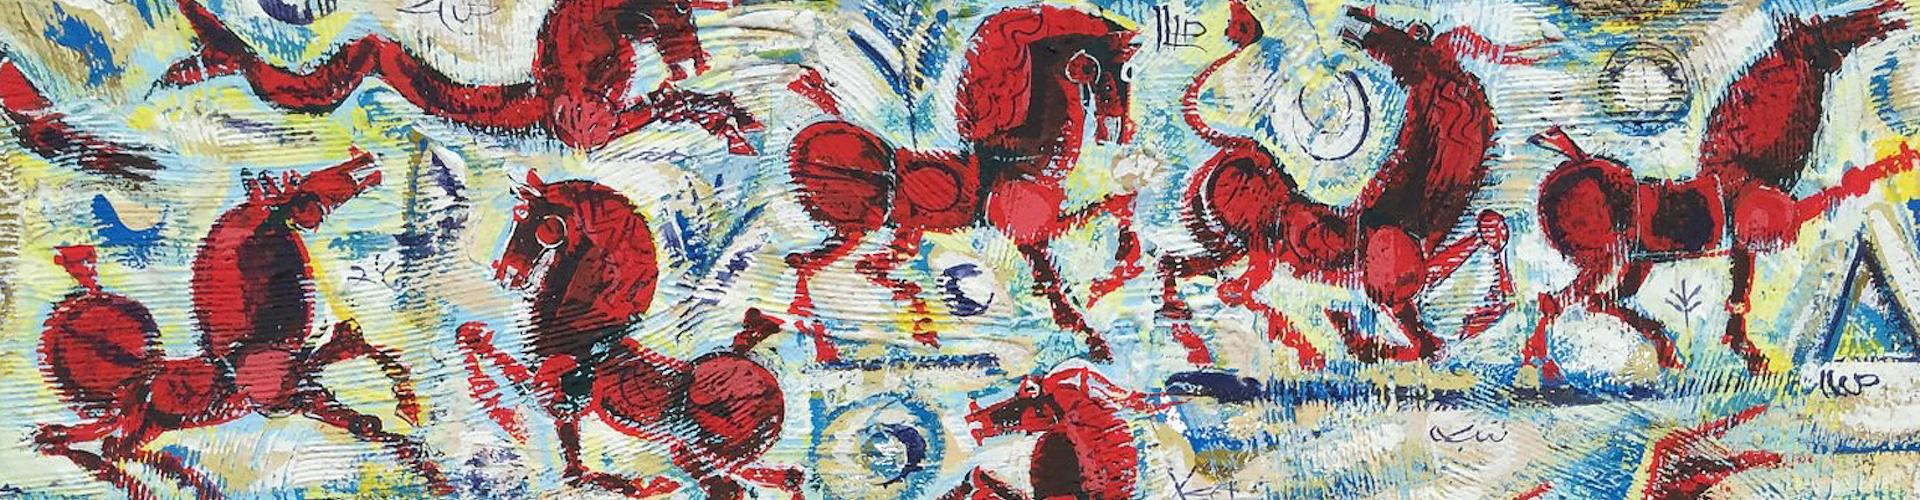 Mohamed Wandavi - Galleria d'Arte - D'Amico Arreda